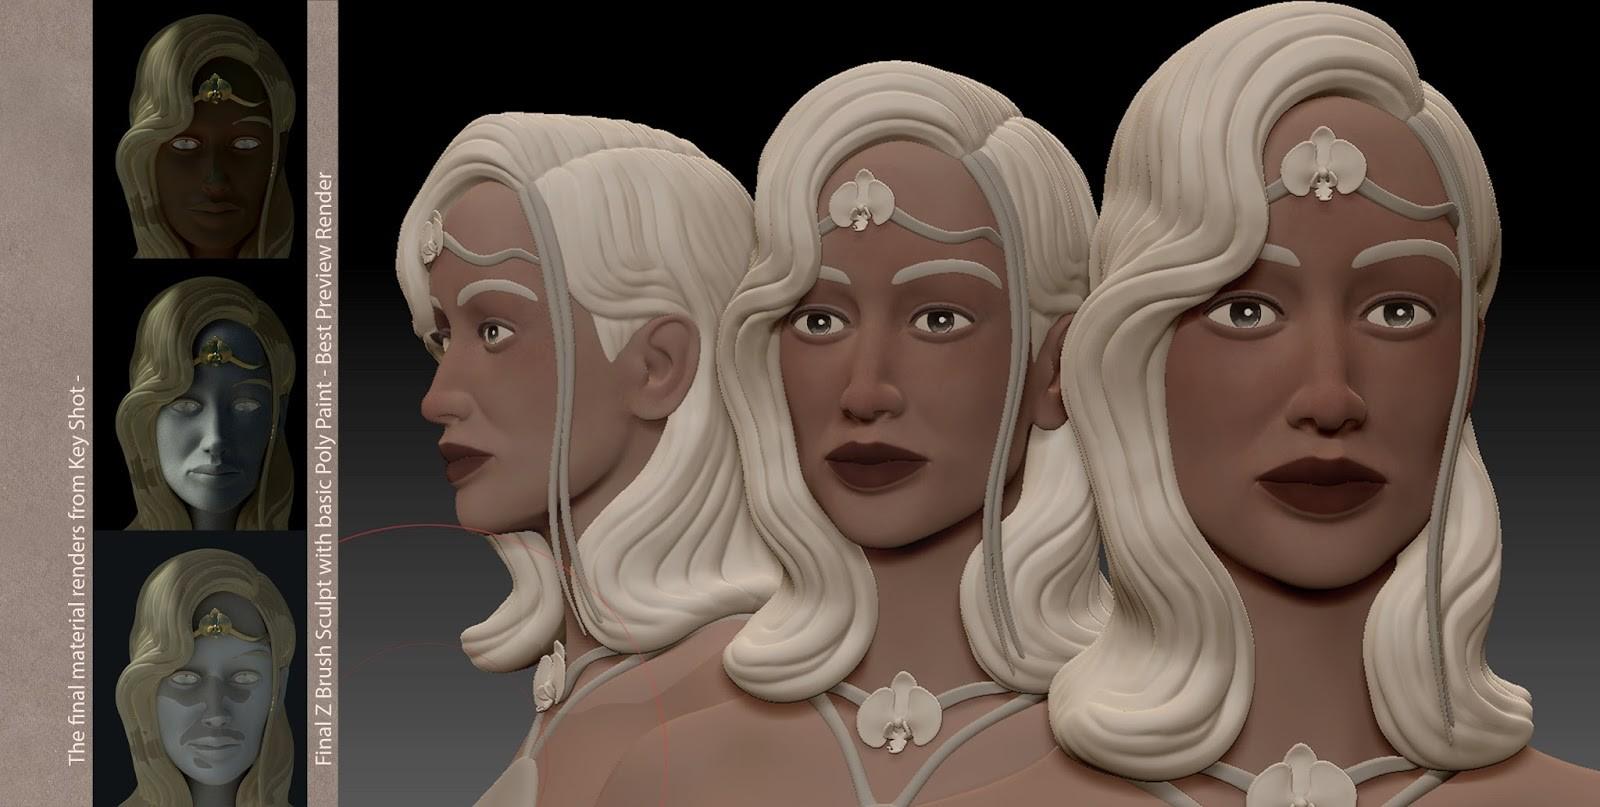 Bradley morgan johnson 06 publication character final sculpt ks renders